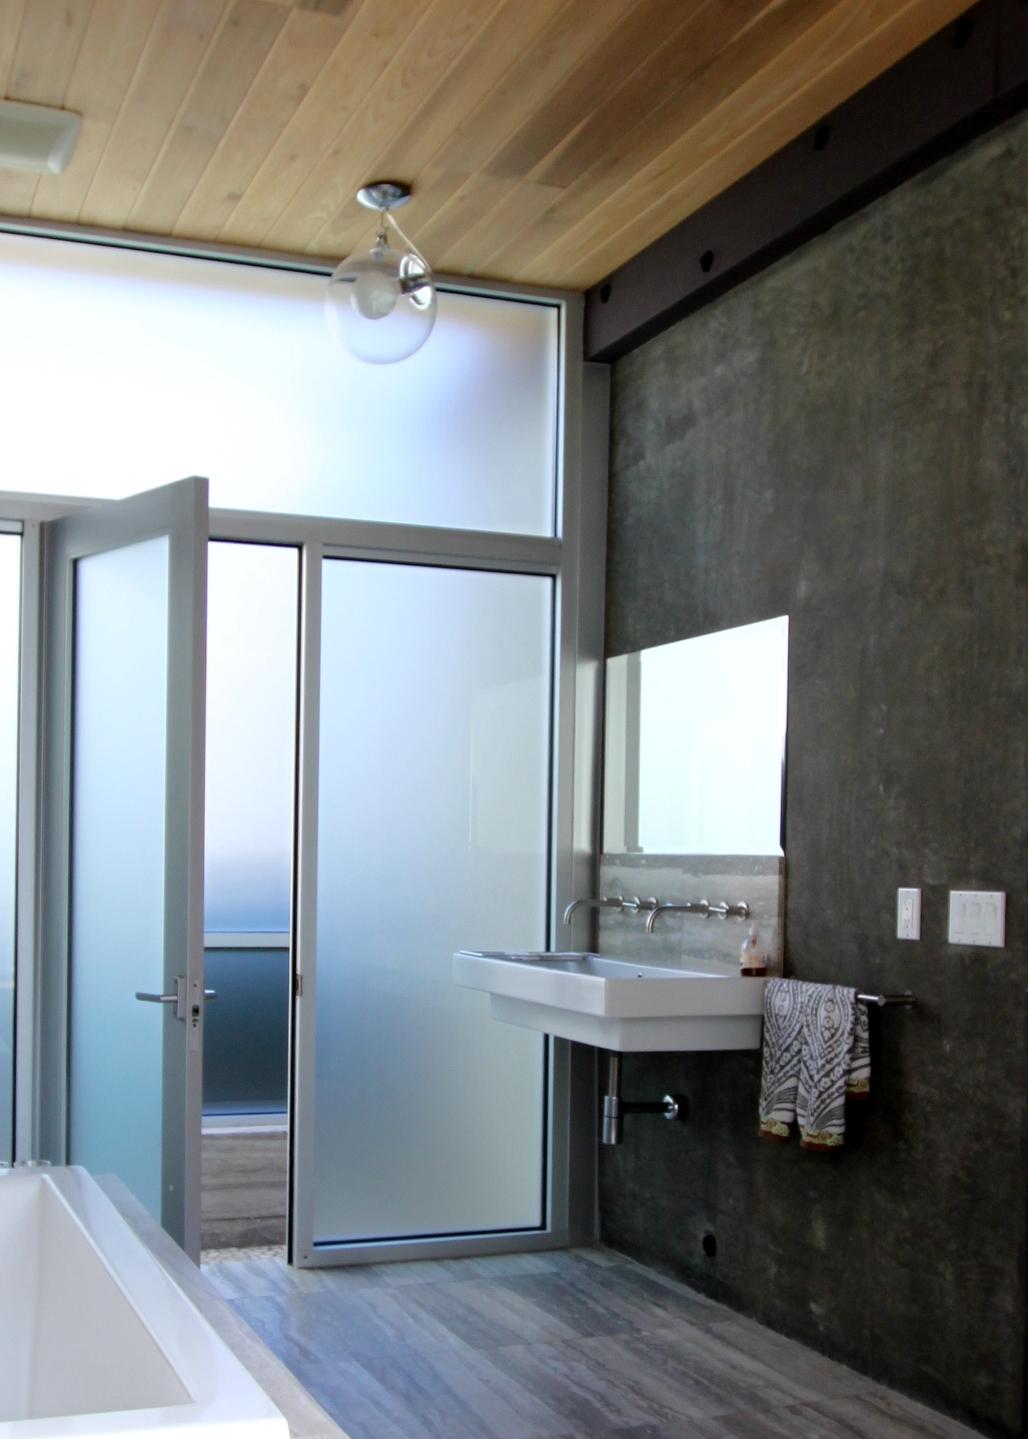 dwell modern san diego #4: harris residence | mid-century modern remodel